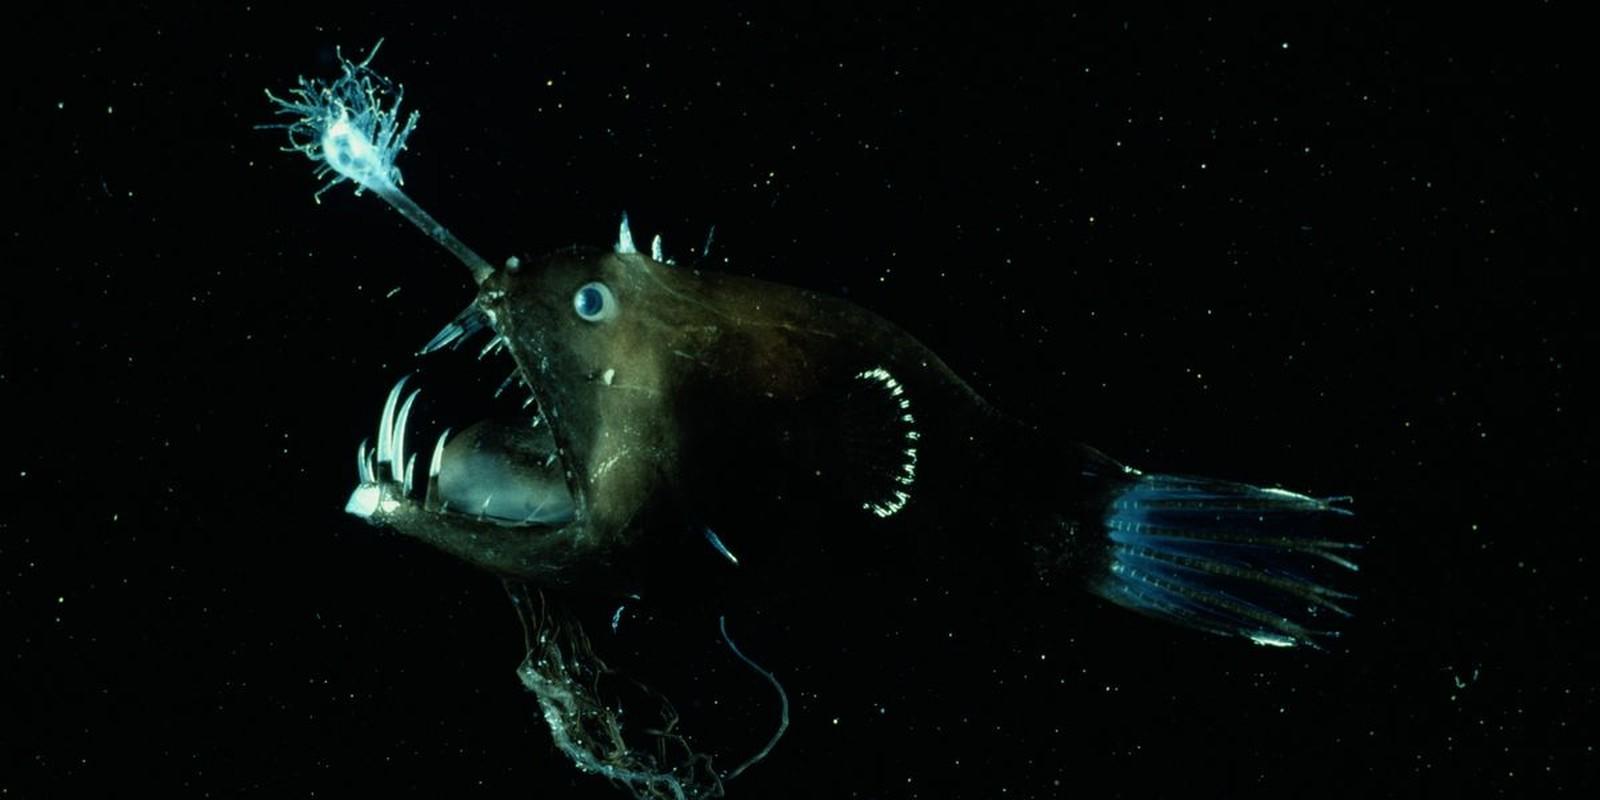 Kieu san moi khiep dam cua ca quy duoi day dai duong Anglerfish-Hinh-7